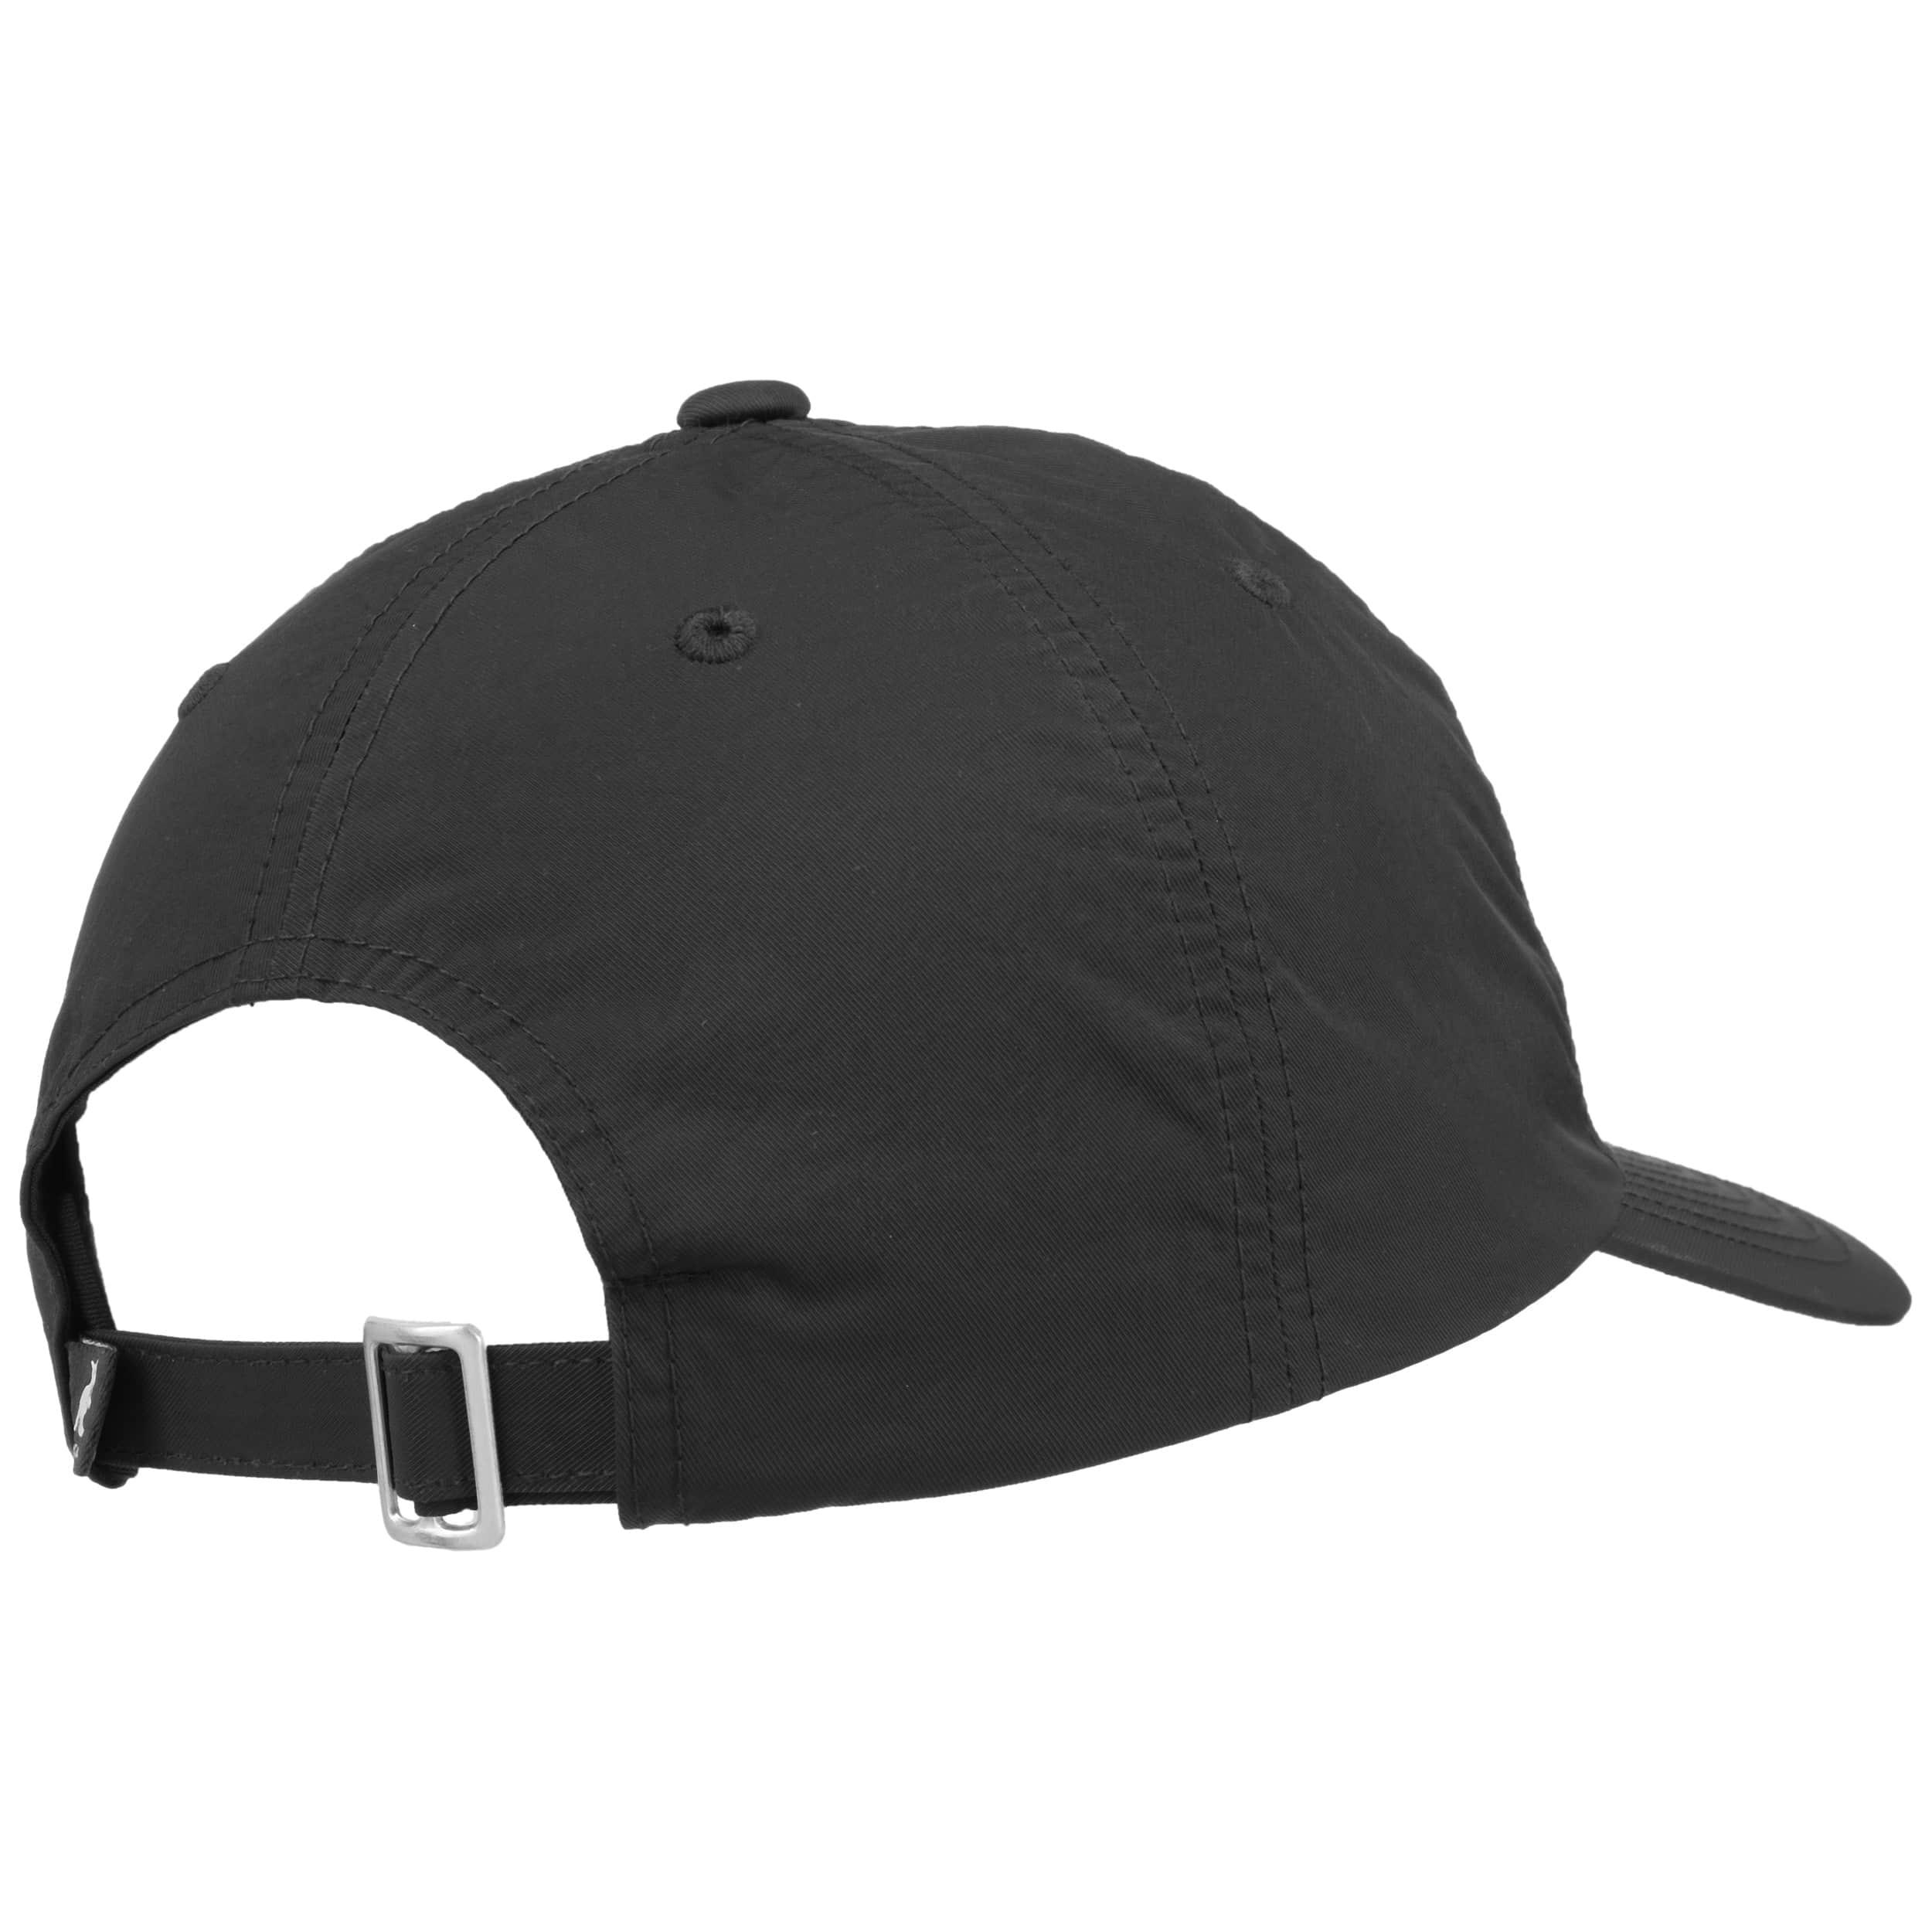 399474df5a2941 ... Vintage Baseball Cap by Kangol - black 3 ...